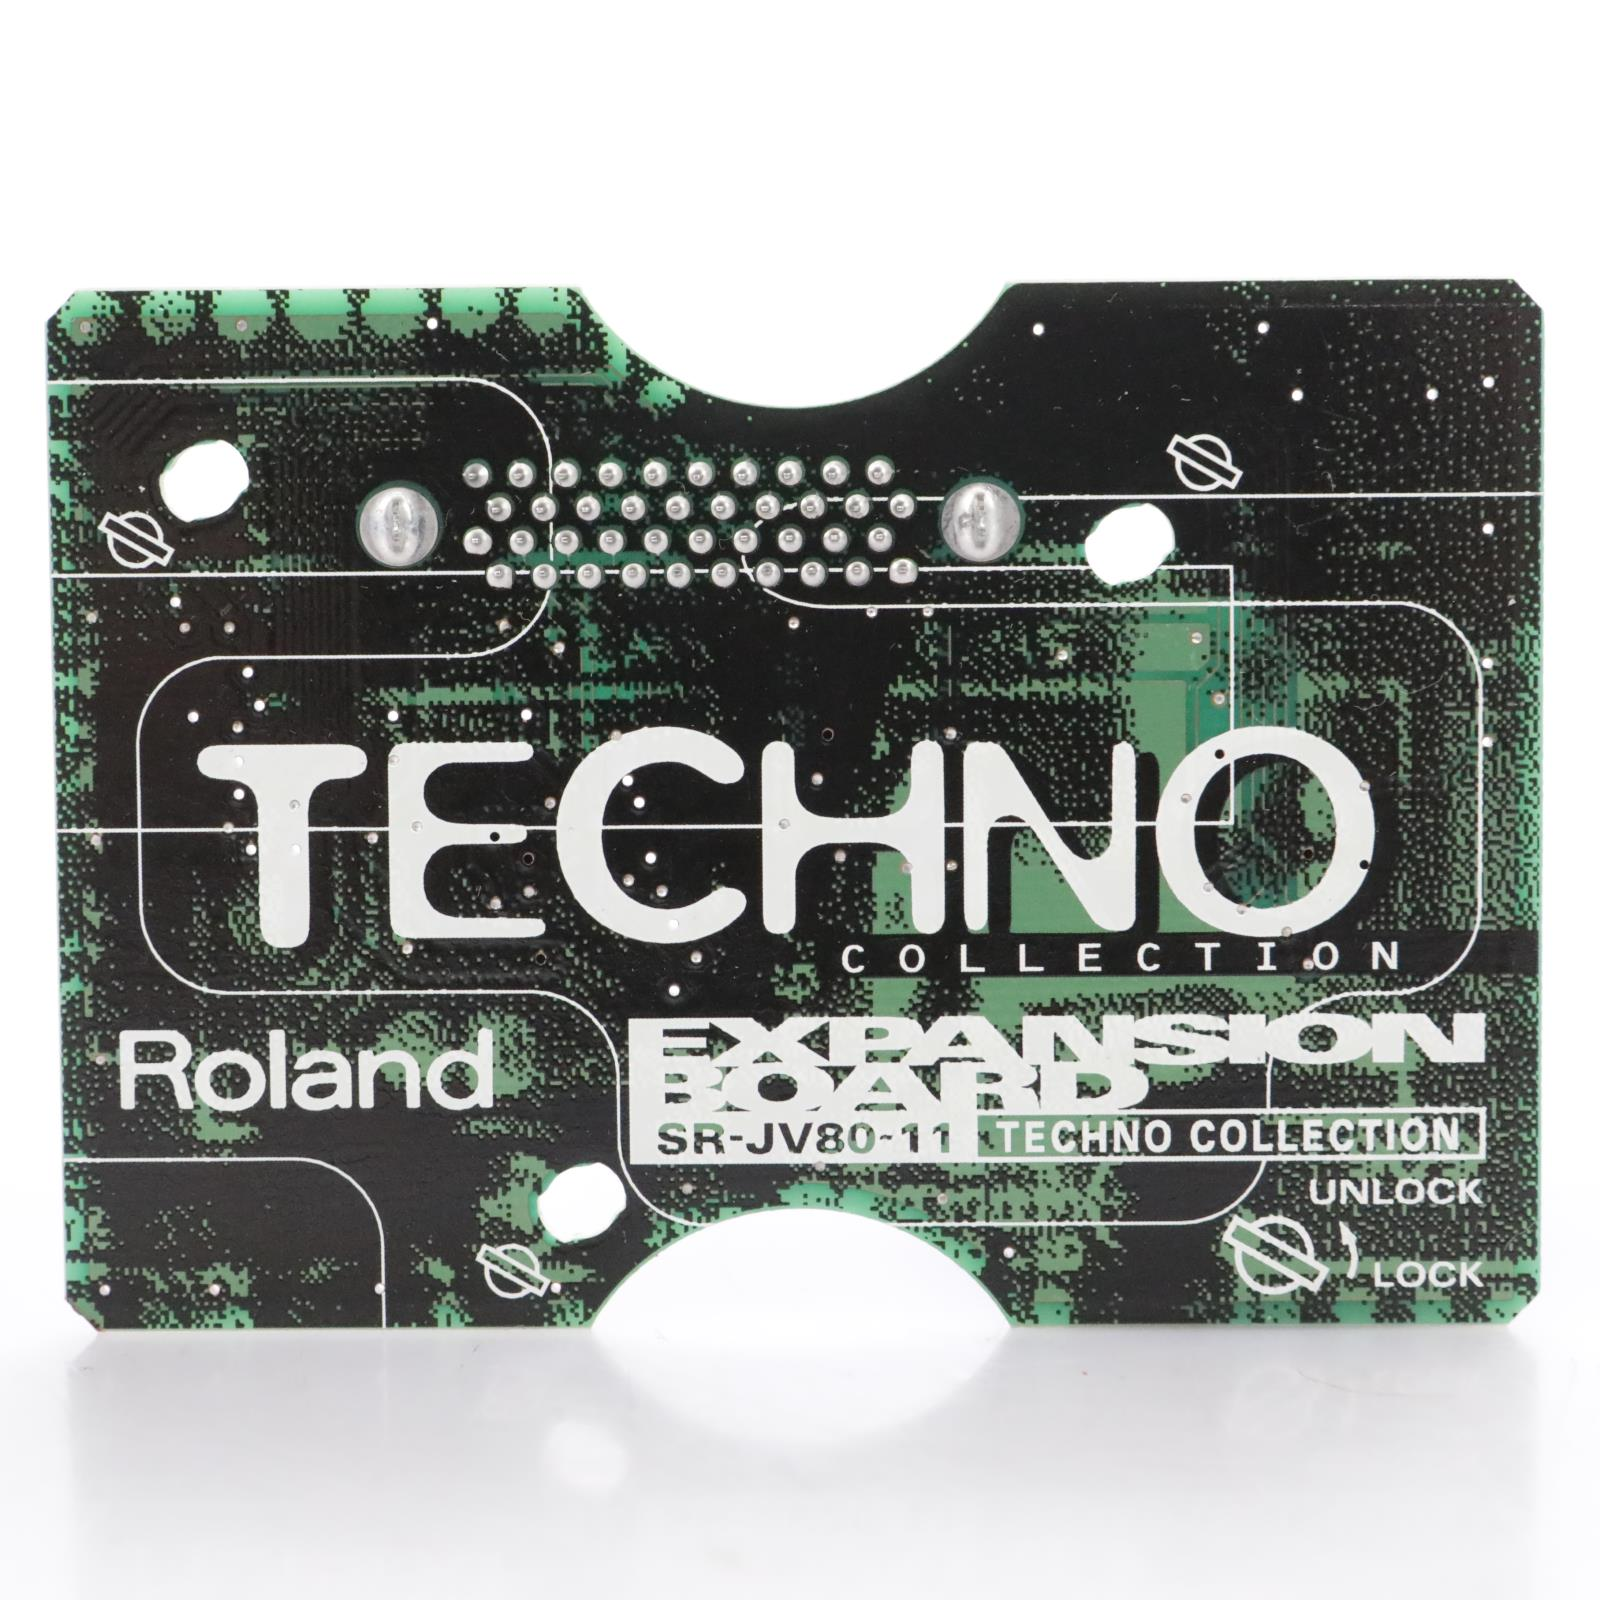 Roland SR-JV80-11 Techno Collection Expansion Board #43767